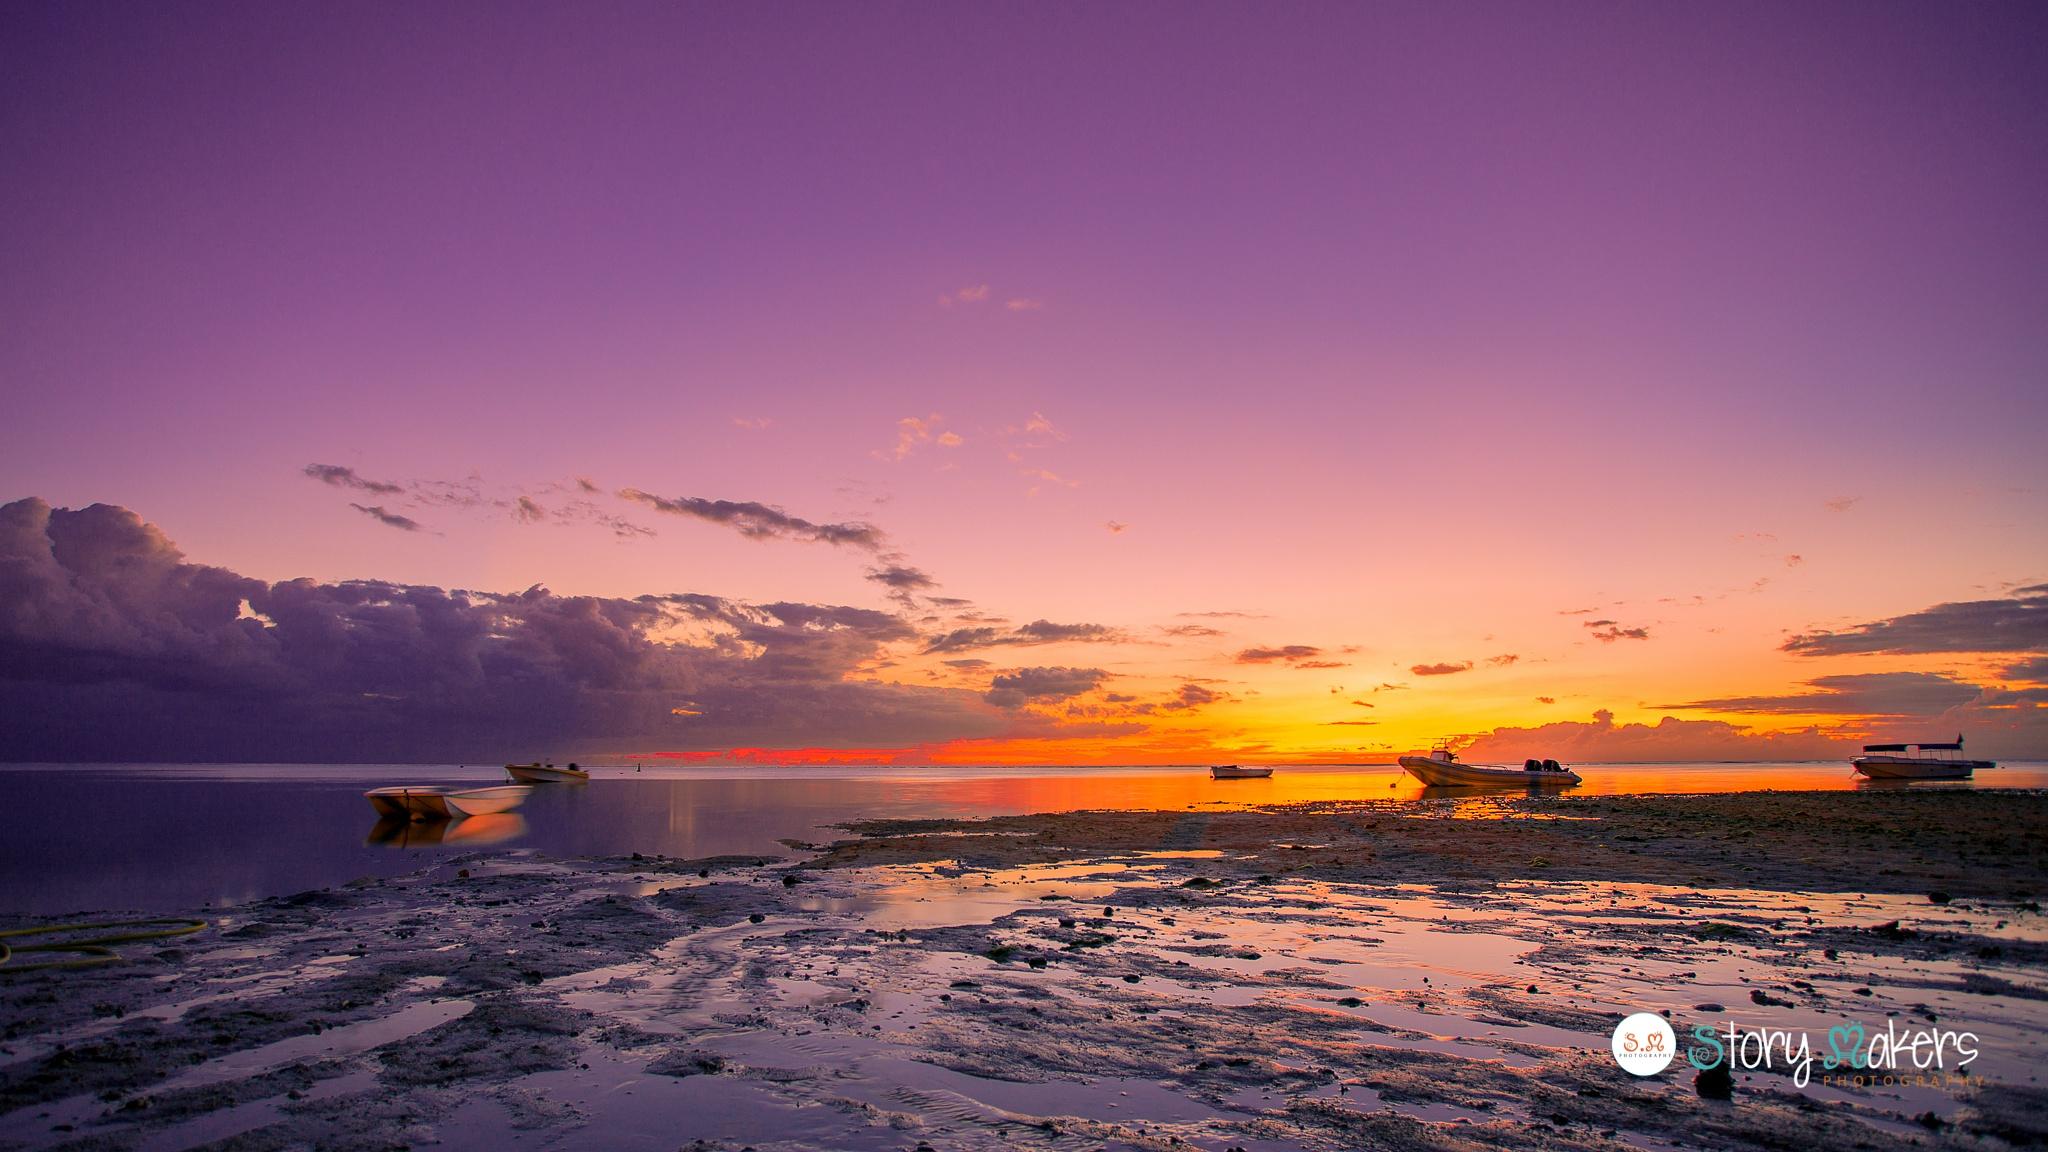 My island Mauritius Sunset by Nauseen Taher